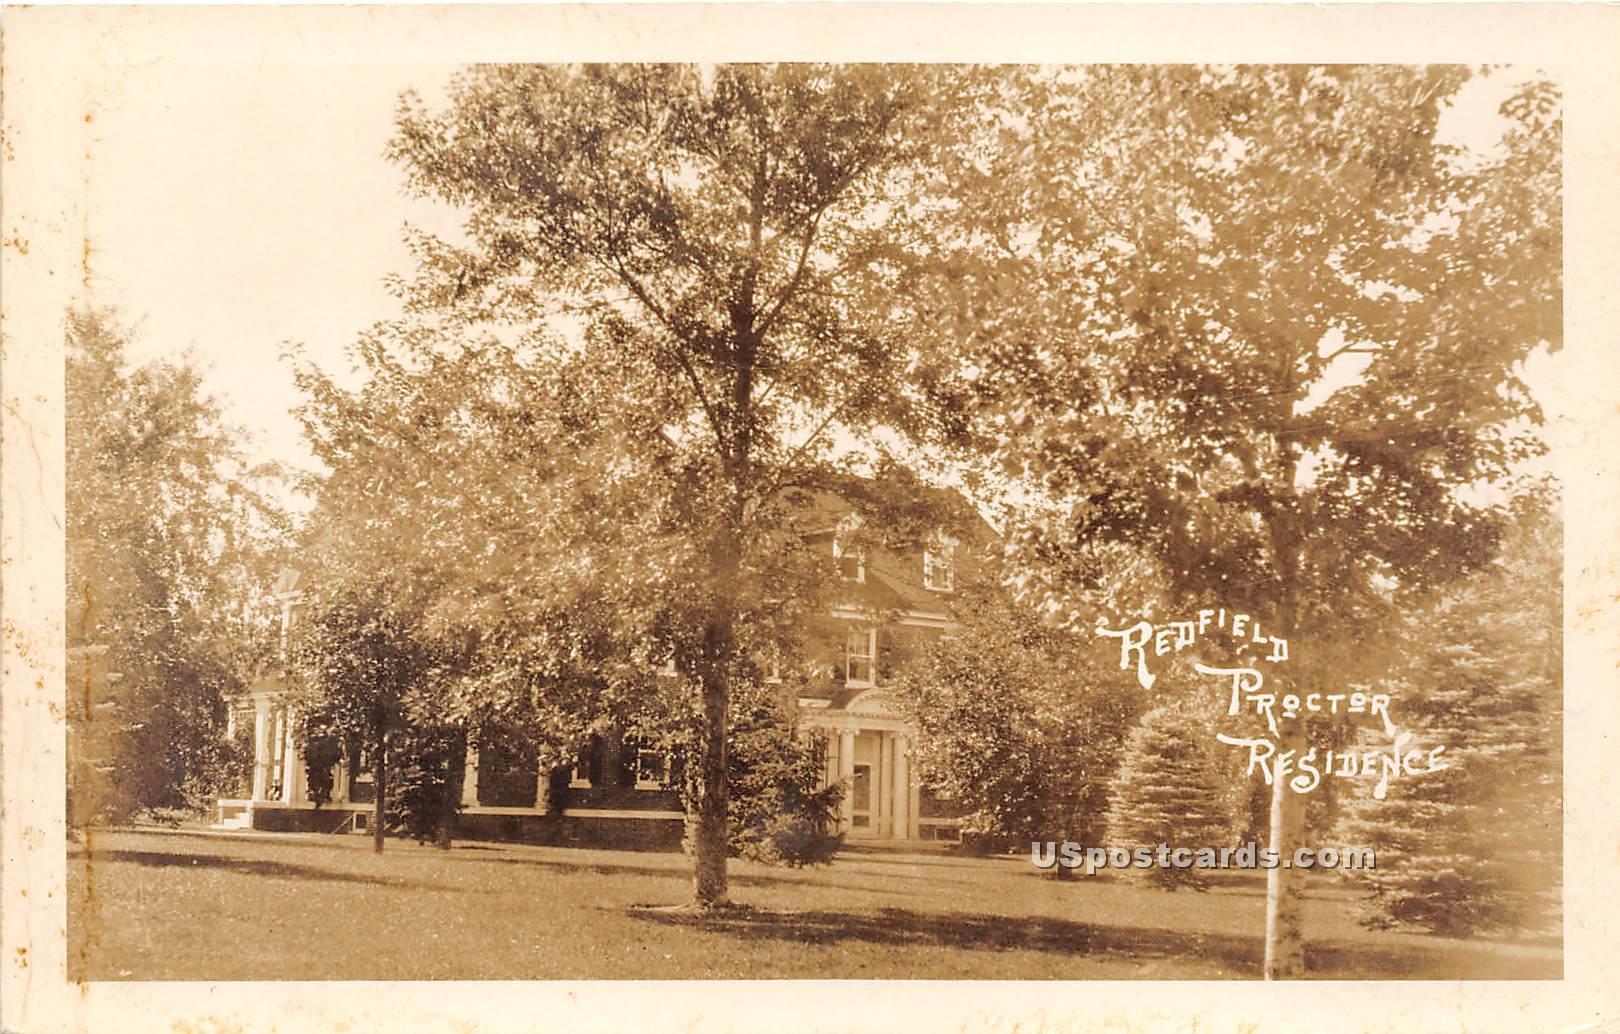 Redfield Proctor's Residence - Vermont VT Postcard